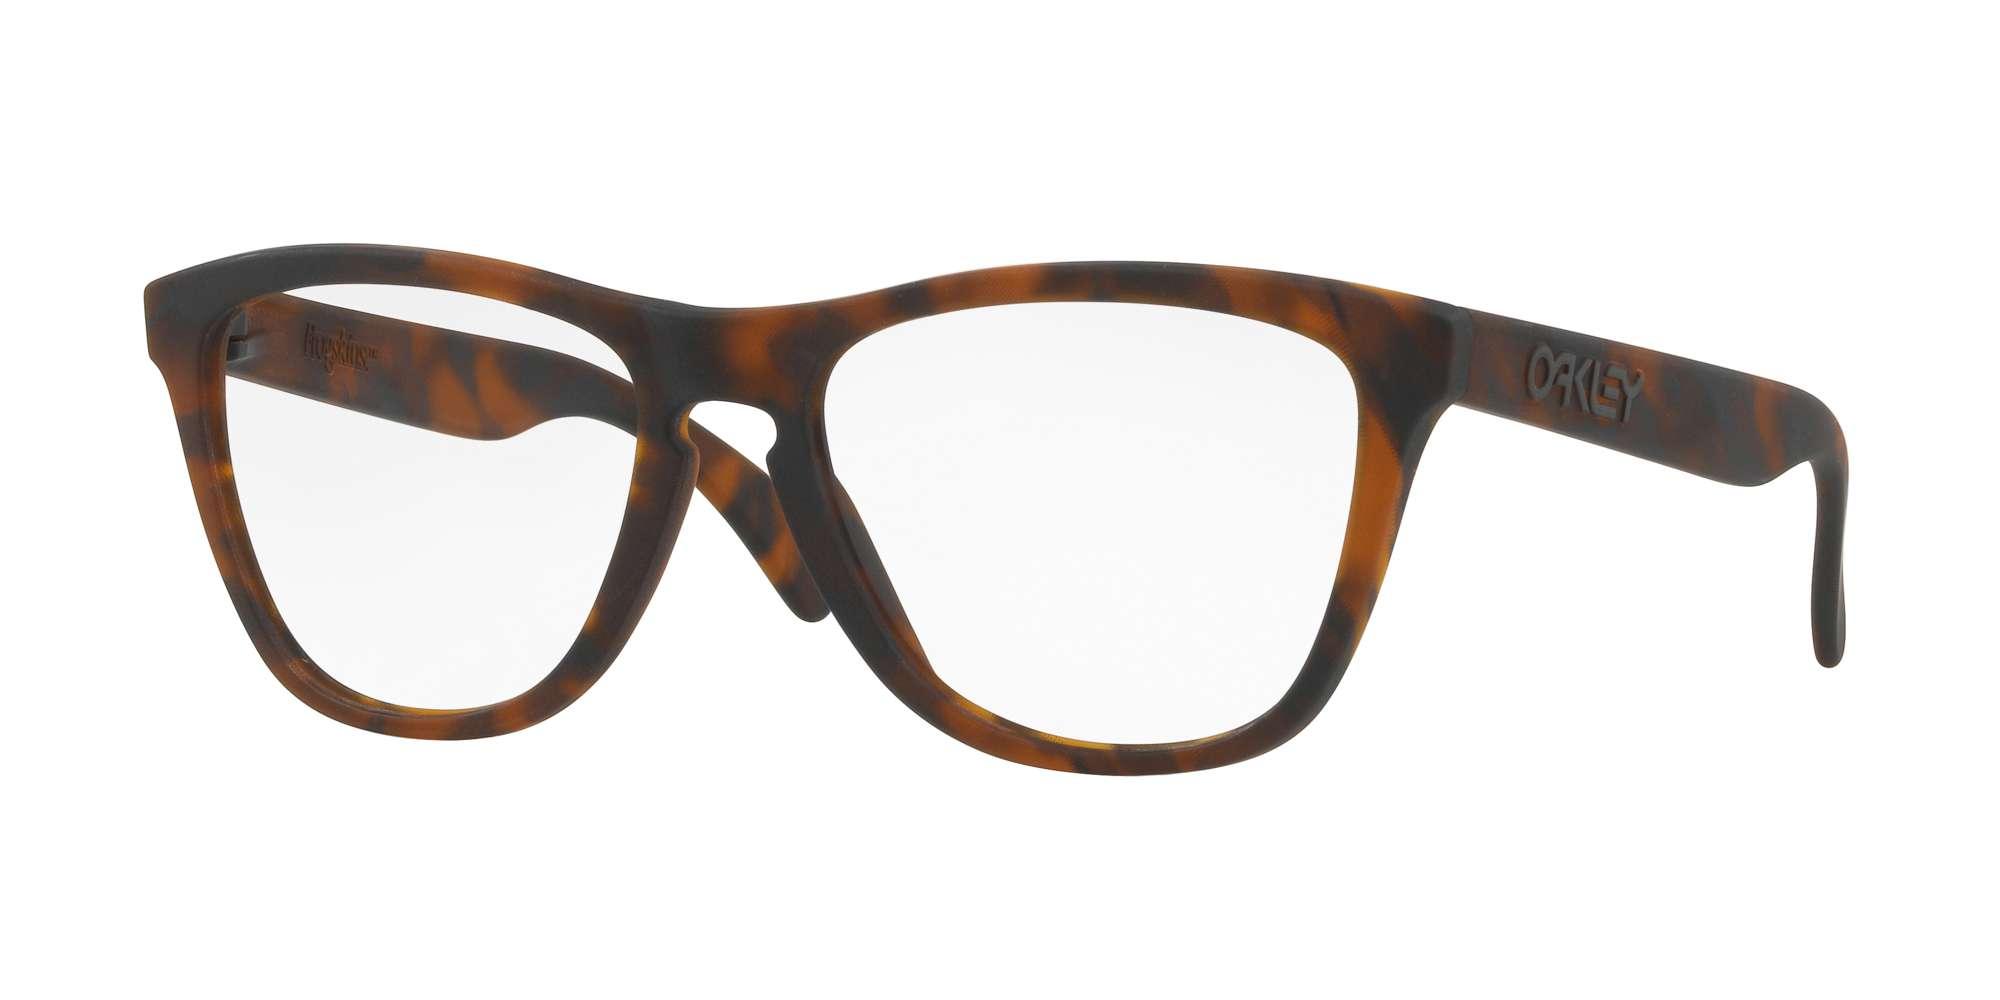 BROWN TORTOISE / CLEAR lenses